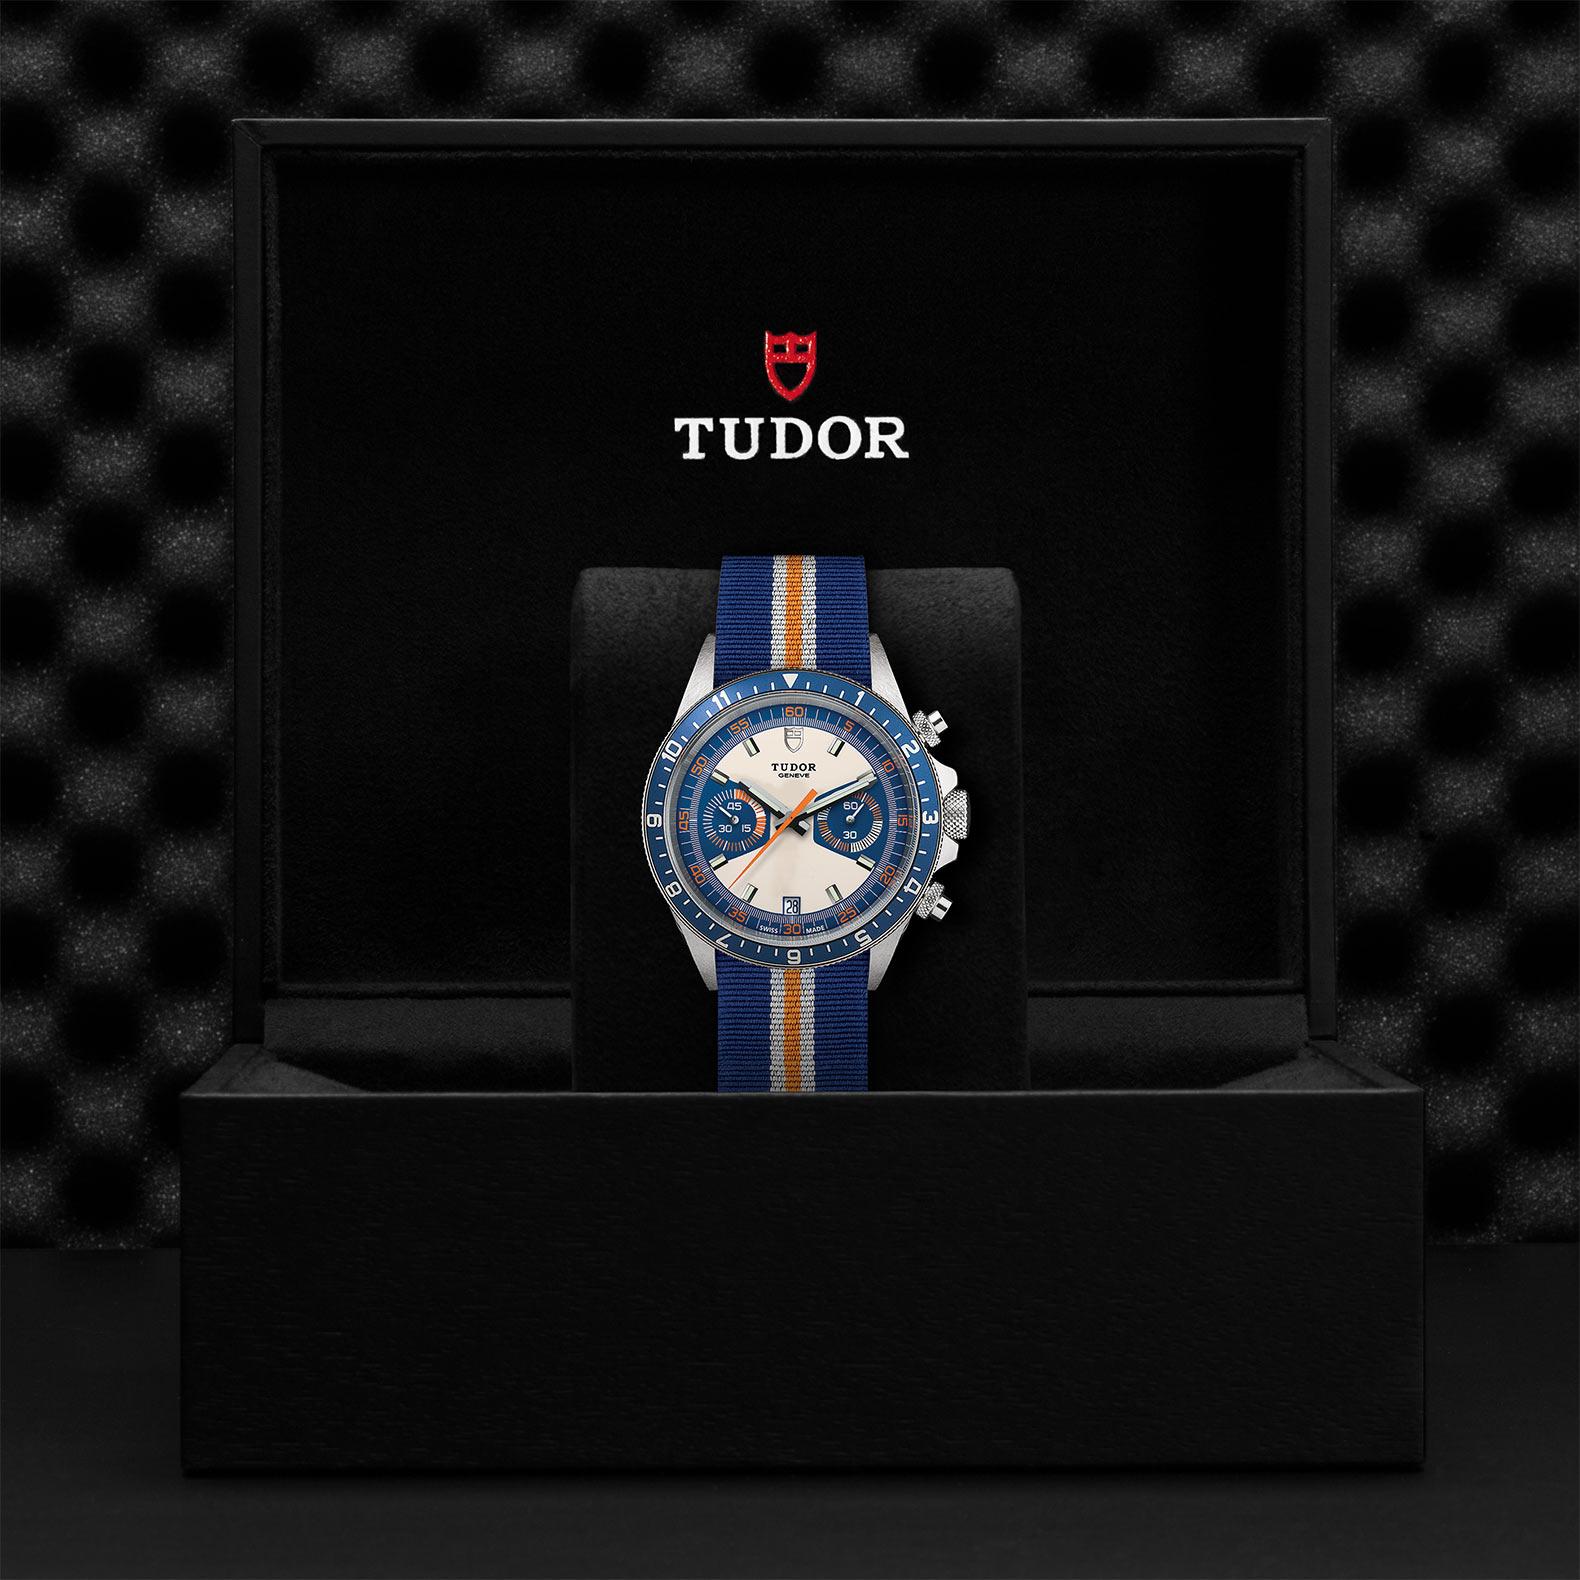 TUDOR チューダー ヘリテージ クロノ ブルー M70330B-0003